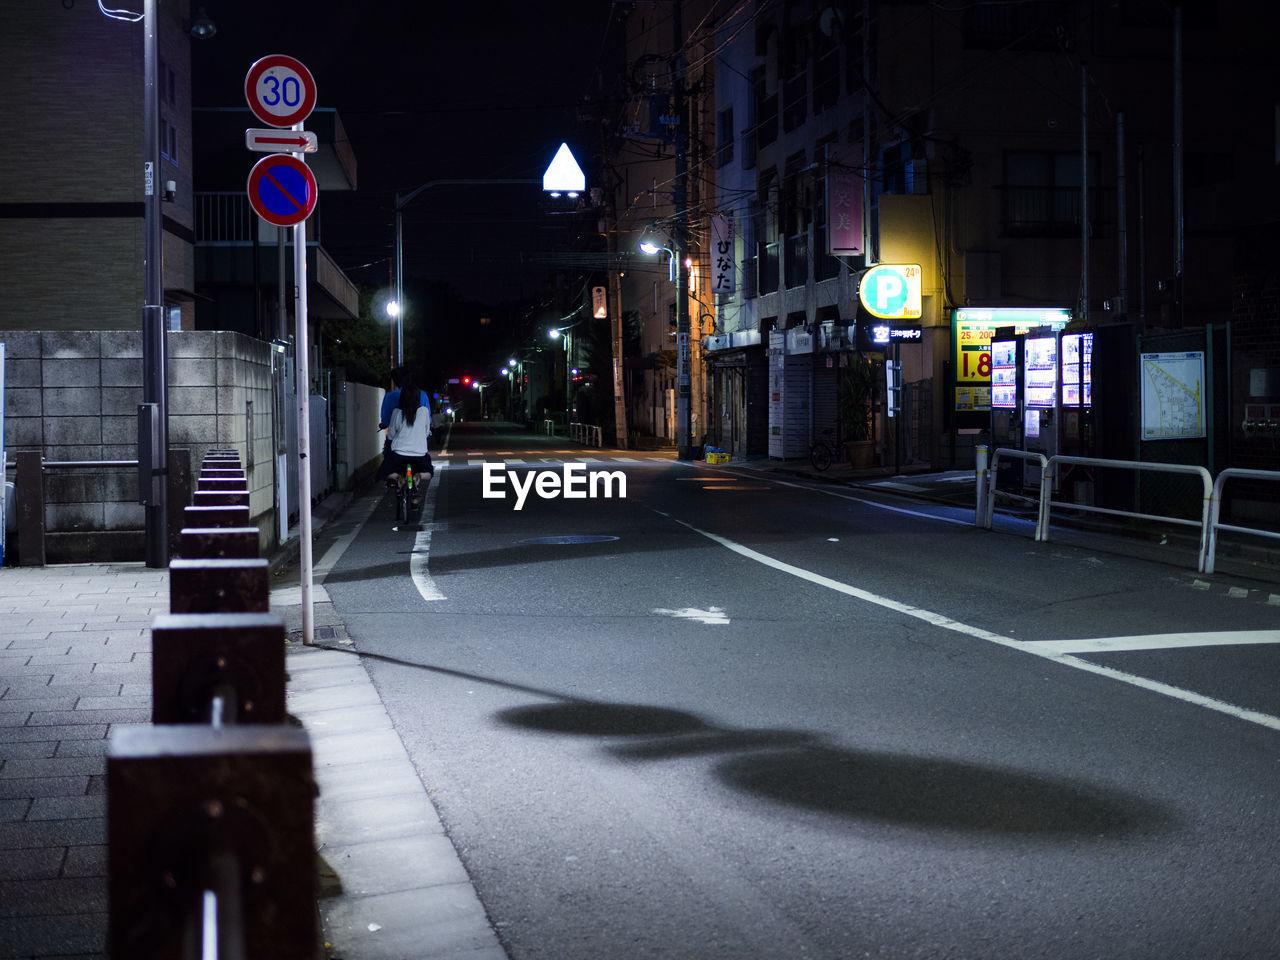 VEHICLES ON ROAD AT ILLUMINATED CITY STREET